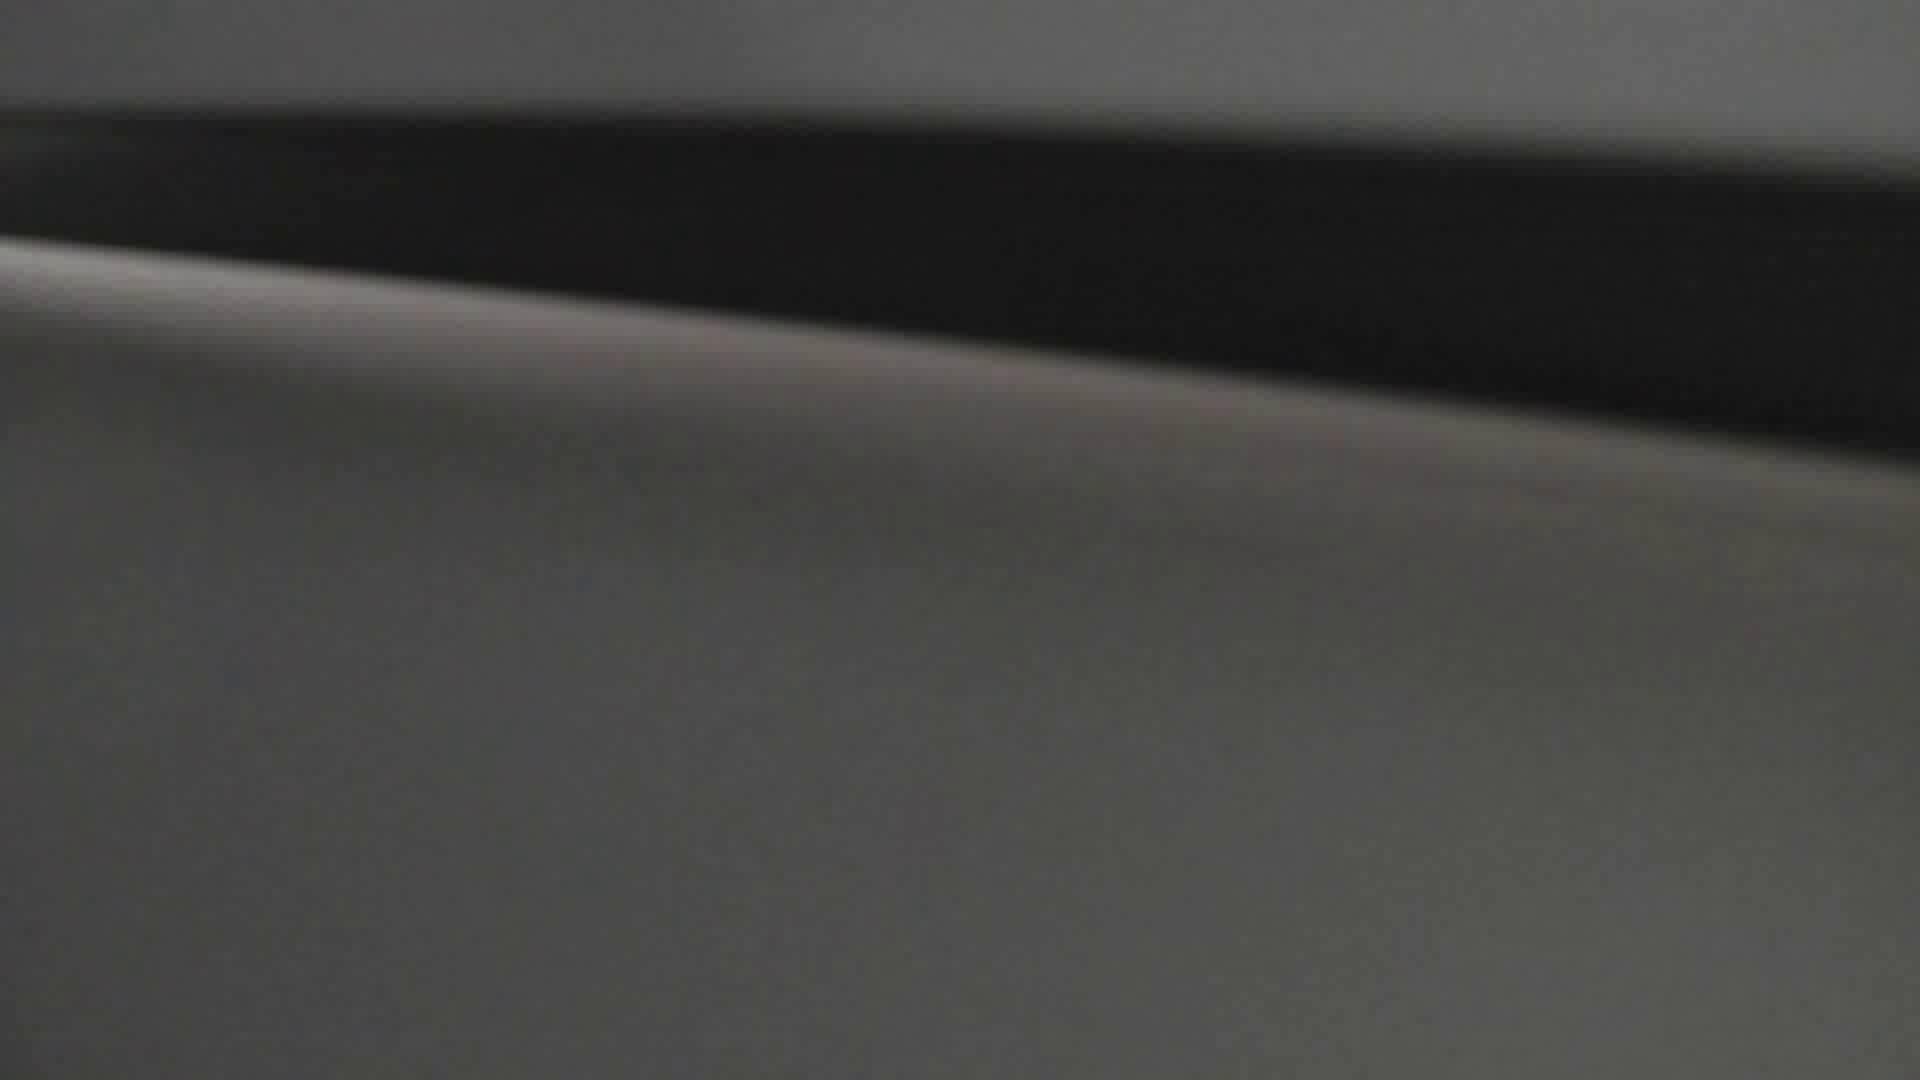 vol.24 命がけ潜伏洗面所! 三十時間潜り、一つしか出会えない完璧桃尻編 洗面所 覗きワレメ動画紹介 94pic 14